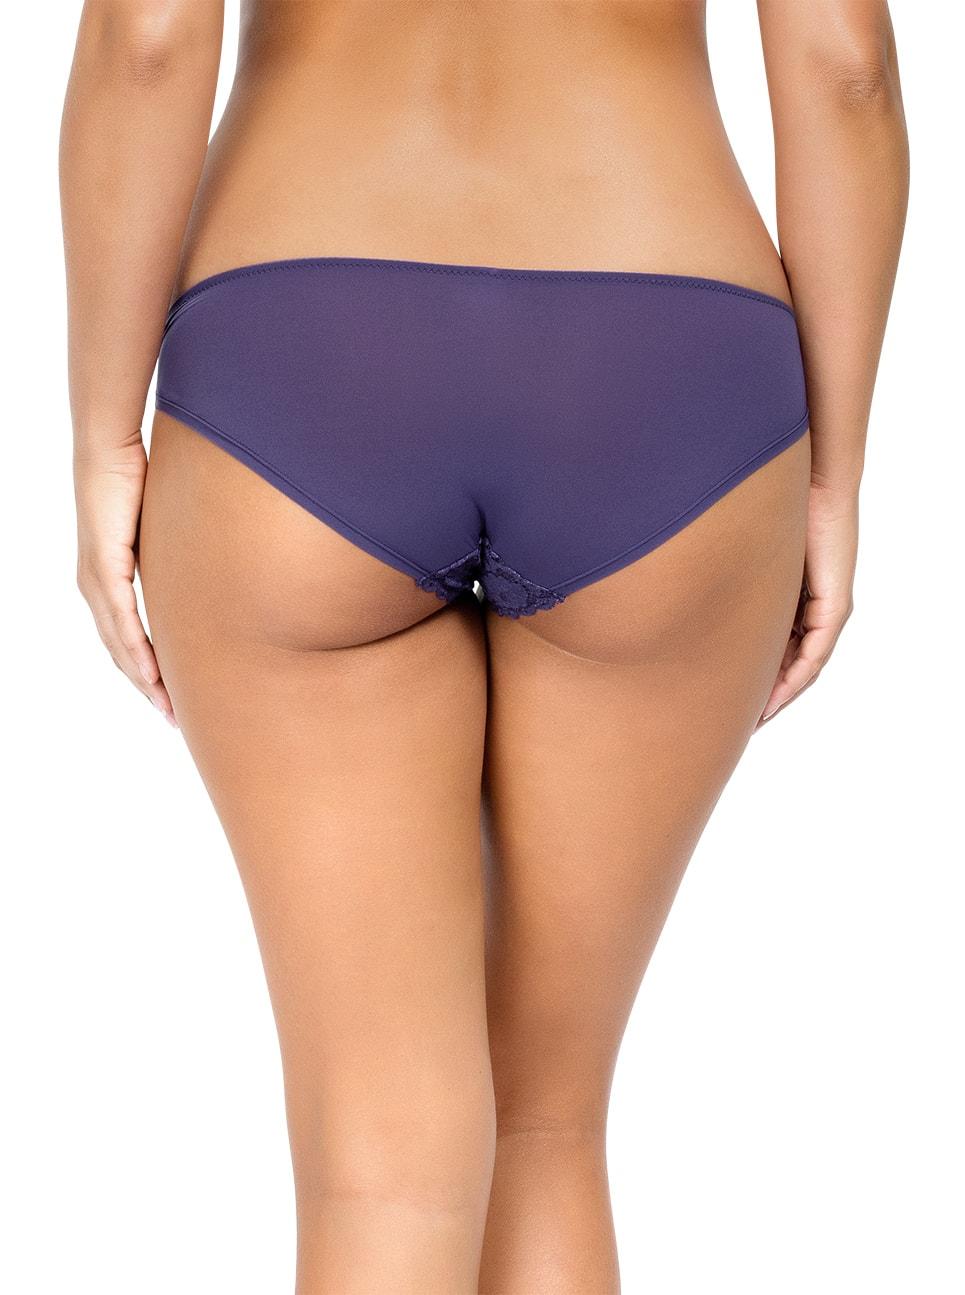 PARFAIT Adriana BikiniP5483 Mulberry Back - Adriana Bikini - Mulberry - P5483